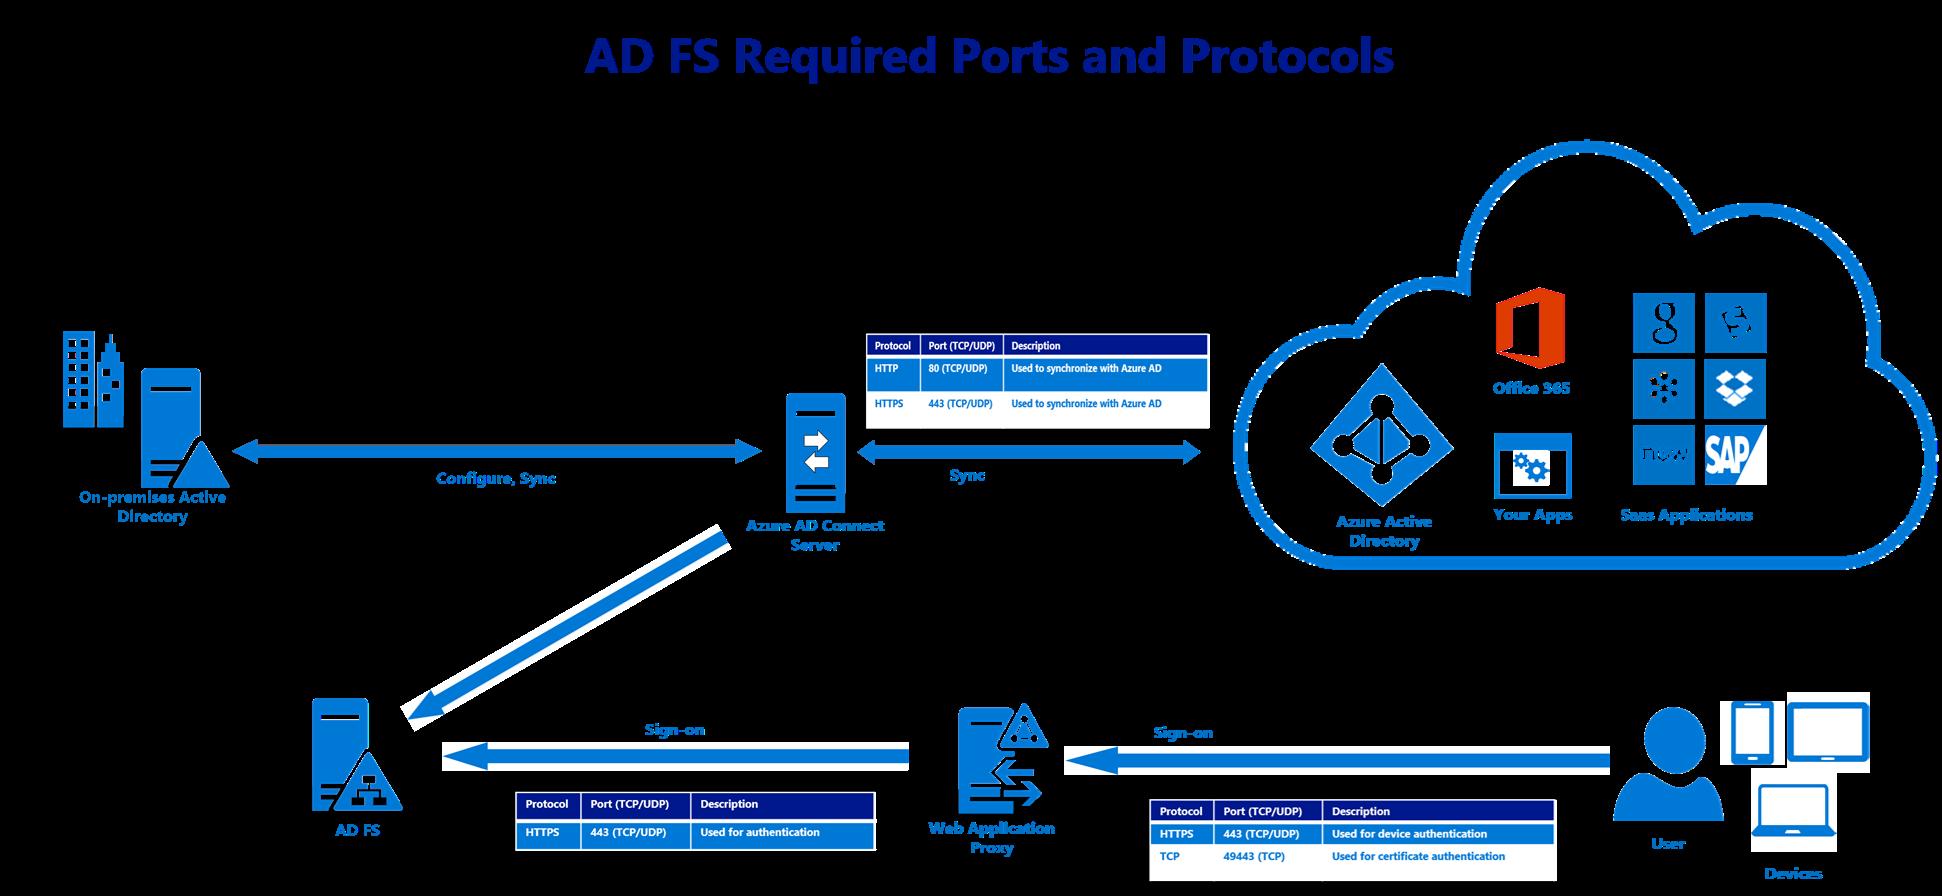 Adfs 및 웹 응용 프로그램 프록시 보안에 대 한 유용한 Microsoft Docs